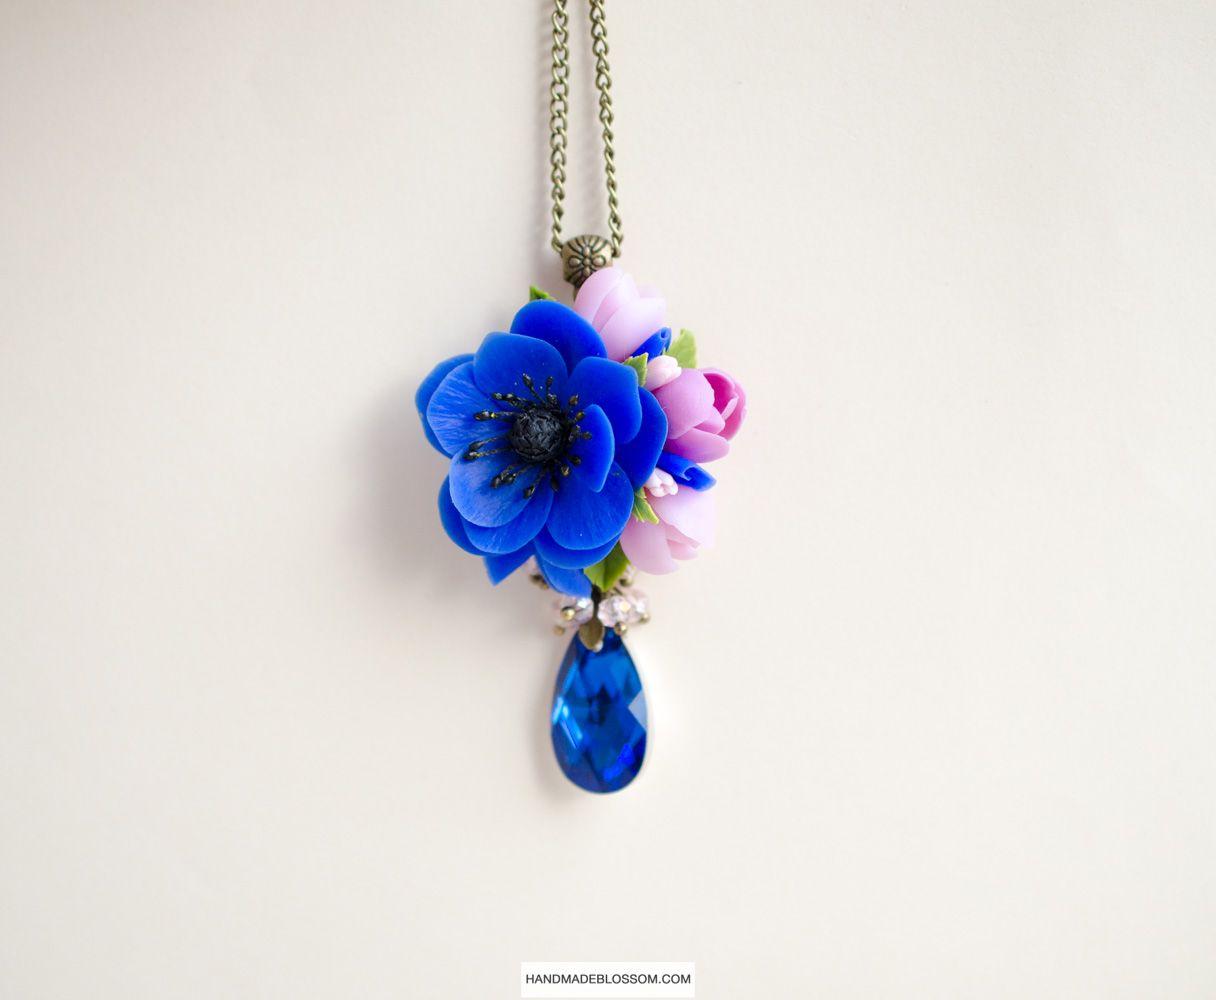 Navy Blue Anemone Pendant Clay Flowers Jewelry Blue And Purple Flowers Swarovski Floral Pendant Polymer Clay Necklace Polymer Clay Jewelry Floral Jewellery